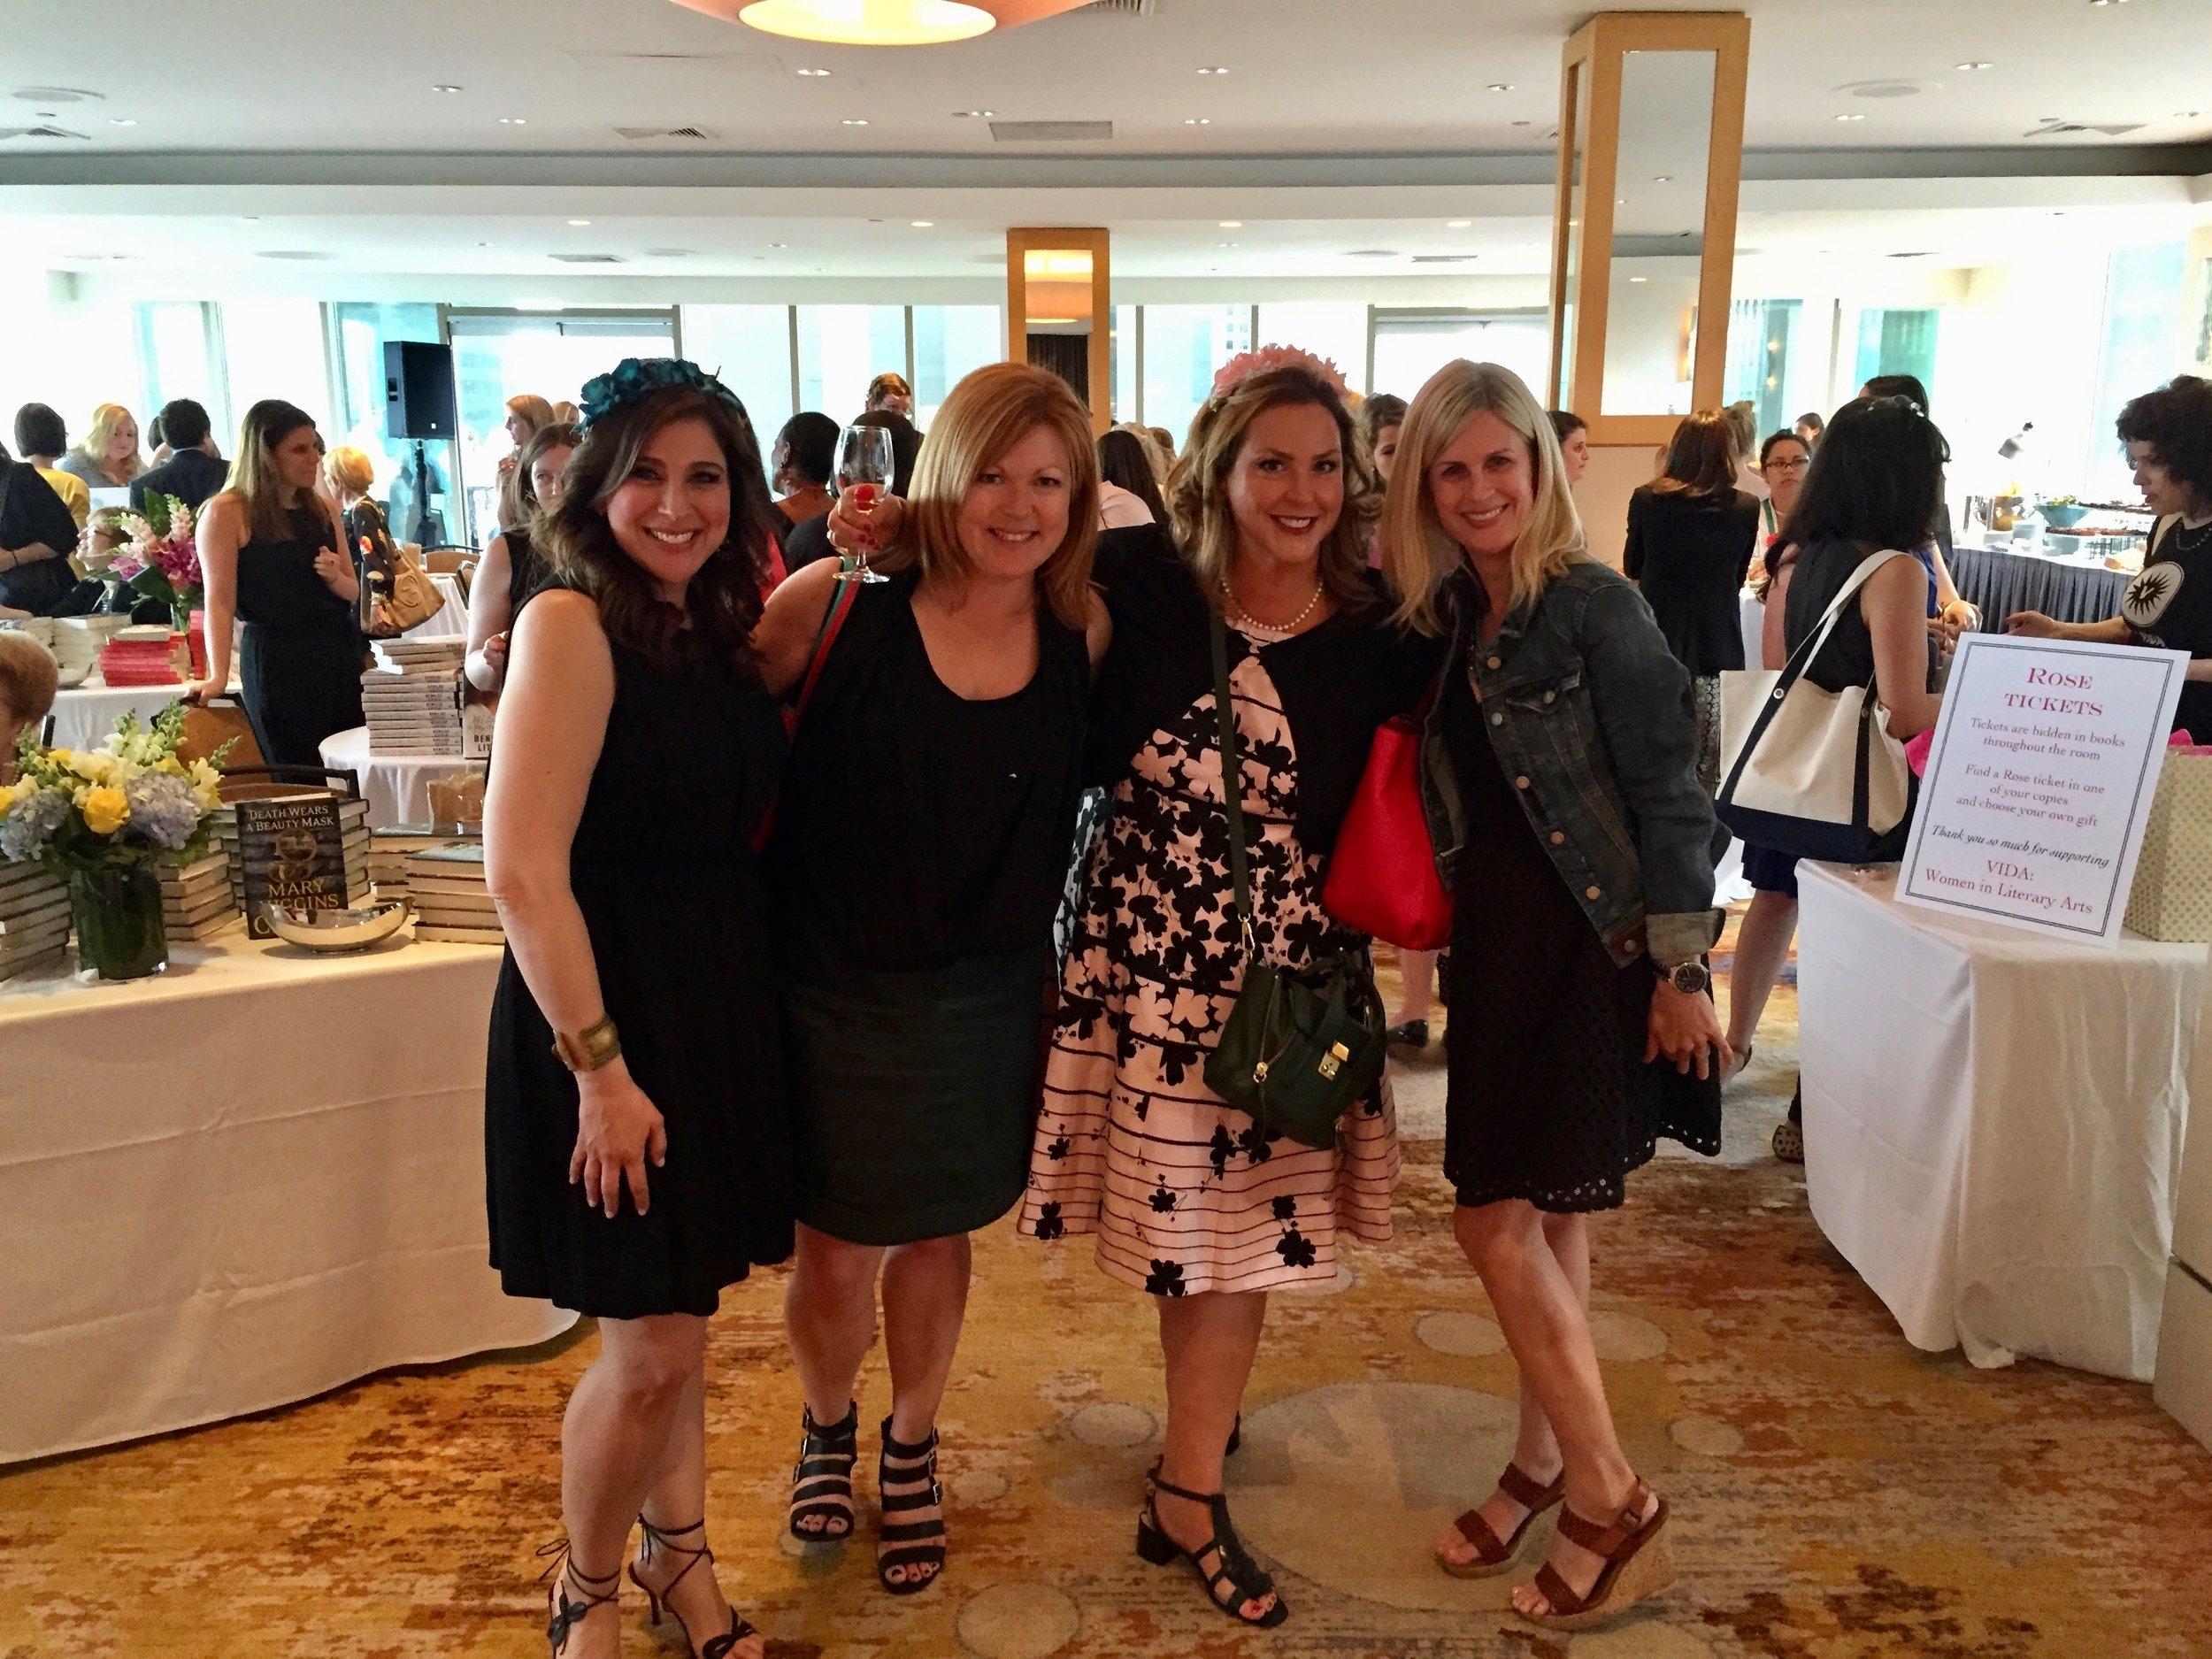 Liz Fenton, Jen Lancaster, Lisa Steinke